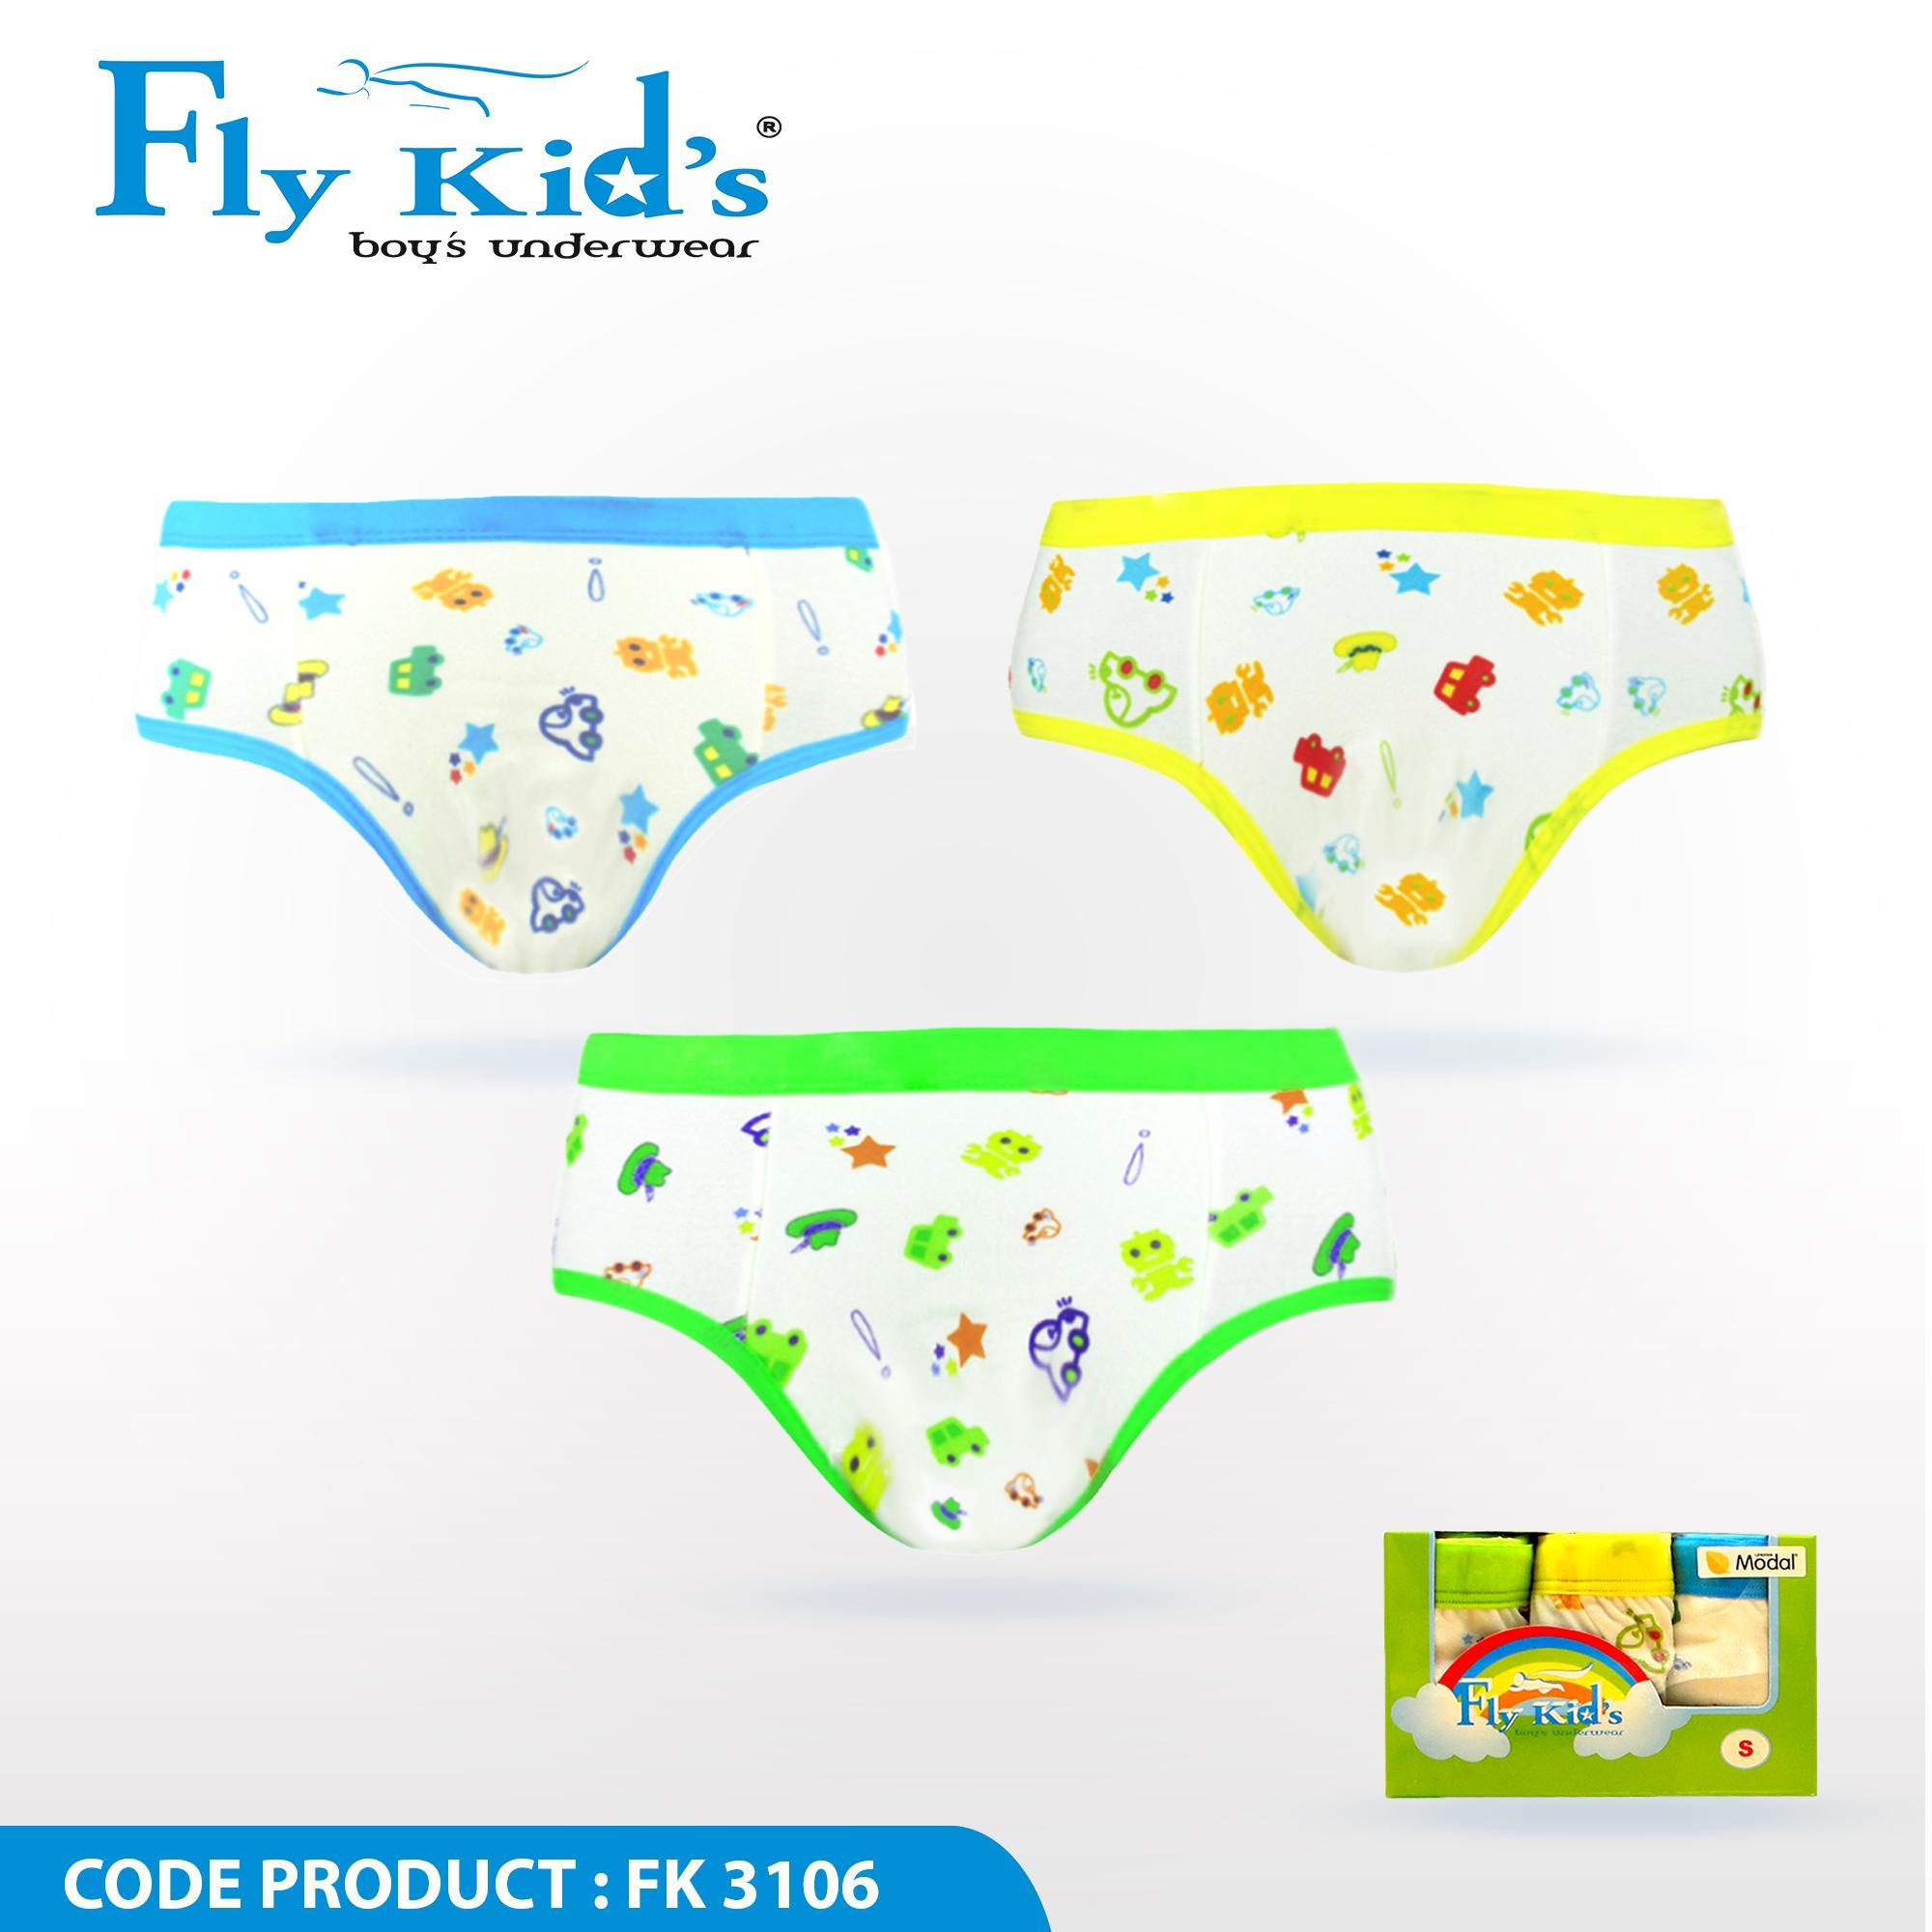 Fashion Pakaian Dalam Anak Laki Celana Pria Agree Original Isi 3 Pcs Flykids Brief Kids Car Underwear Fk 3106